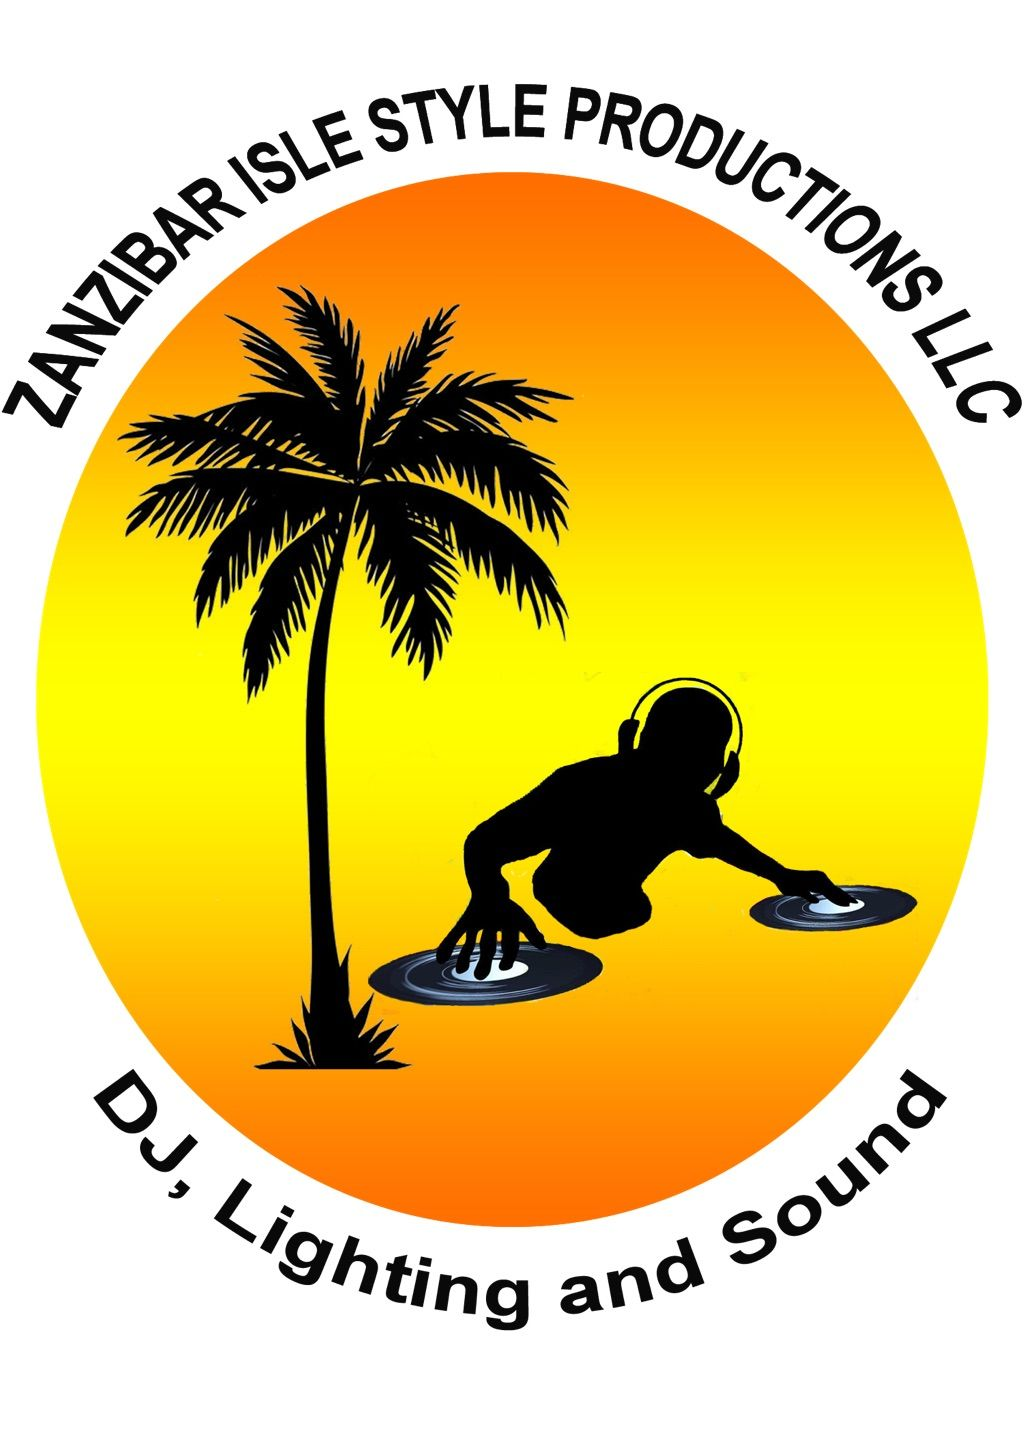 Zanzibar Isle Style Productions, LLC